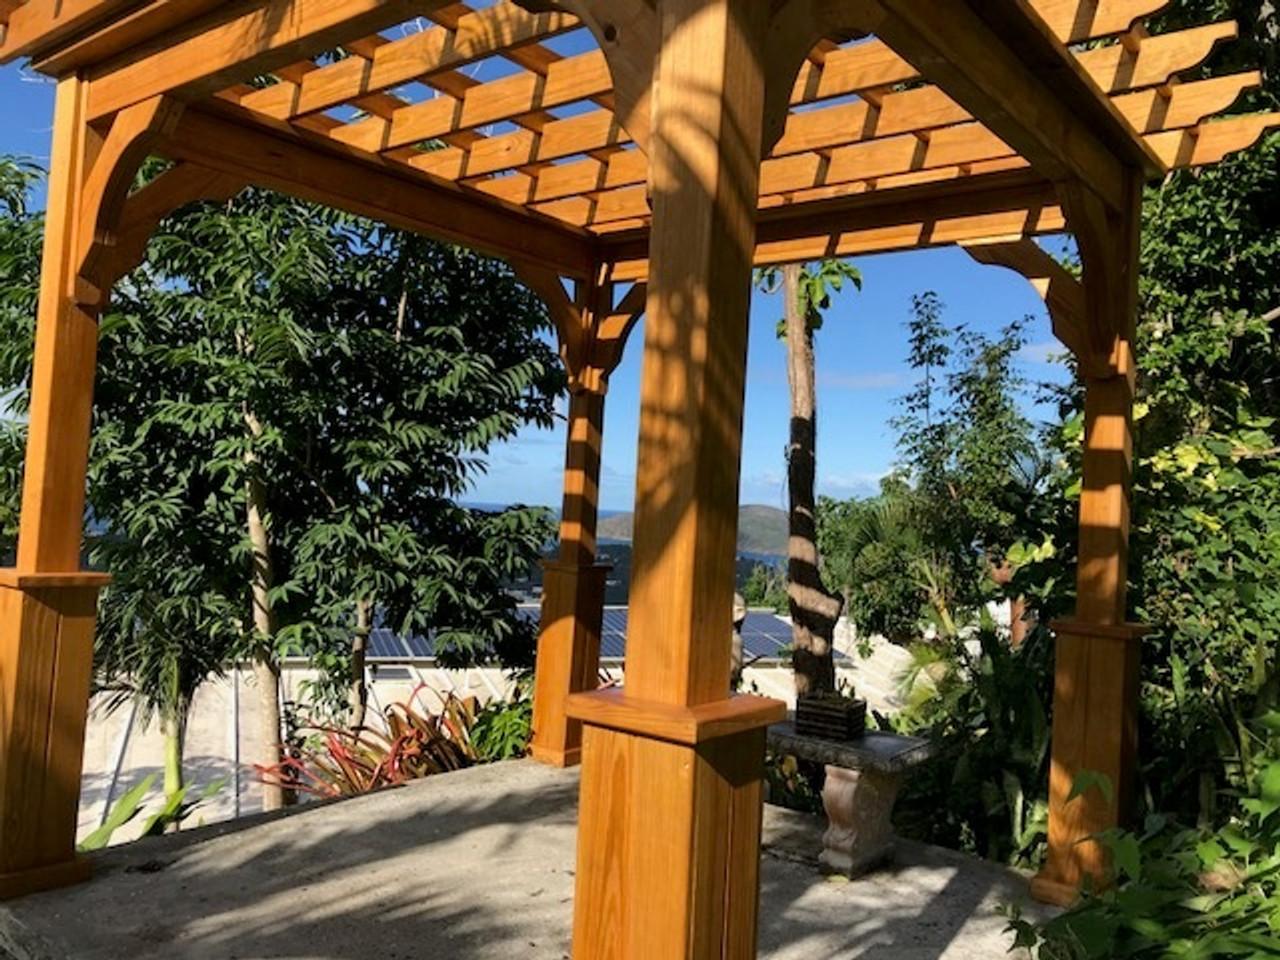 10x10 Pressure Treated Pine Serenity Pergola Kit, Gorgeous Setting in the U.S. Virgin Islands